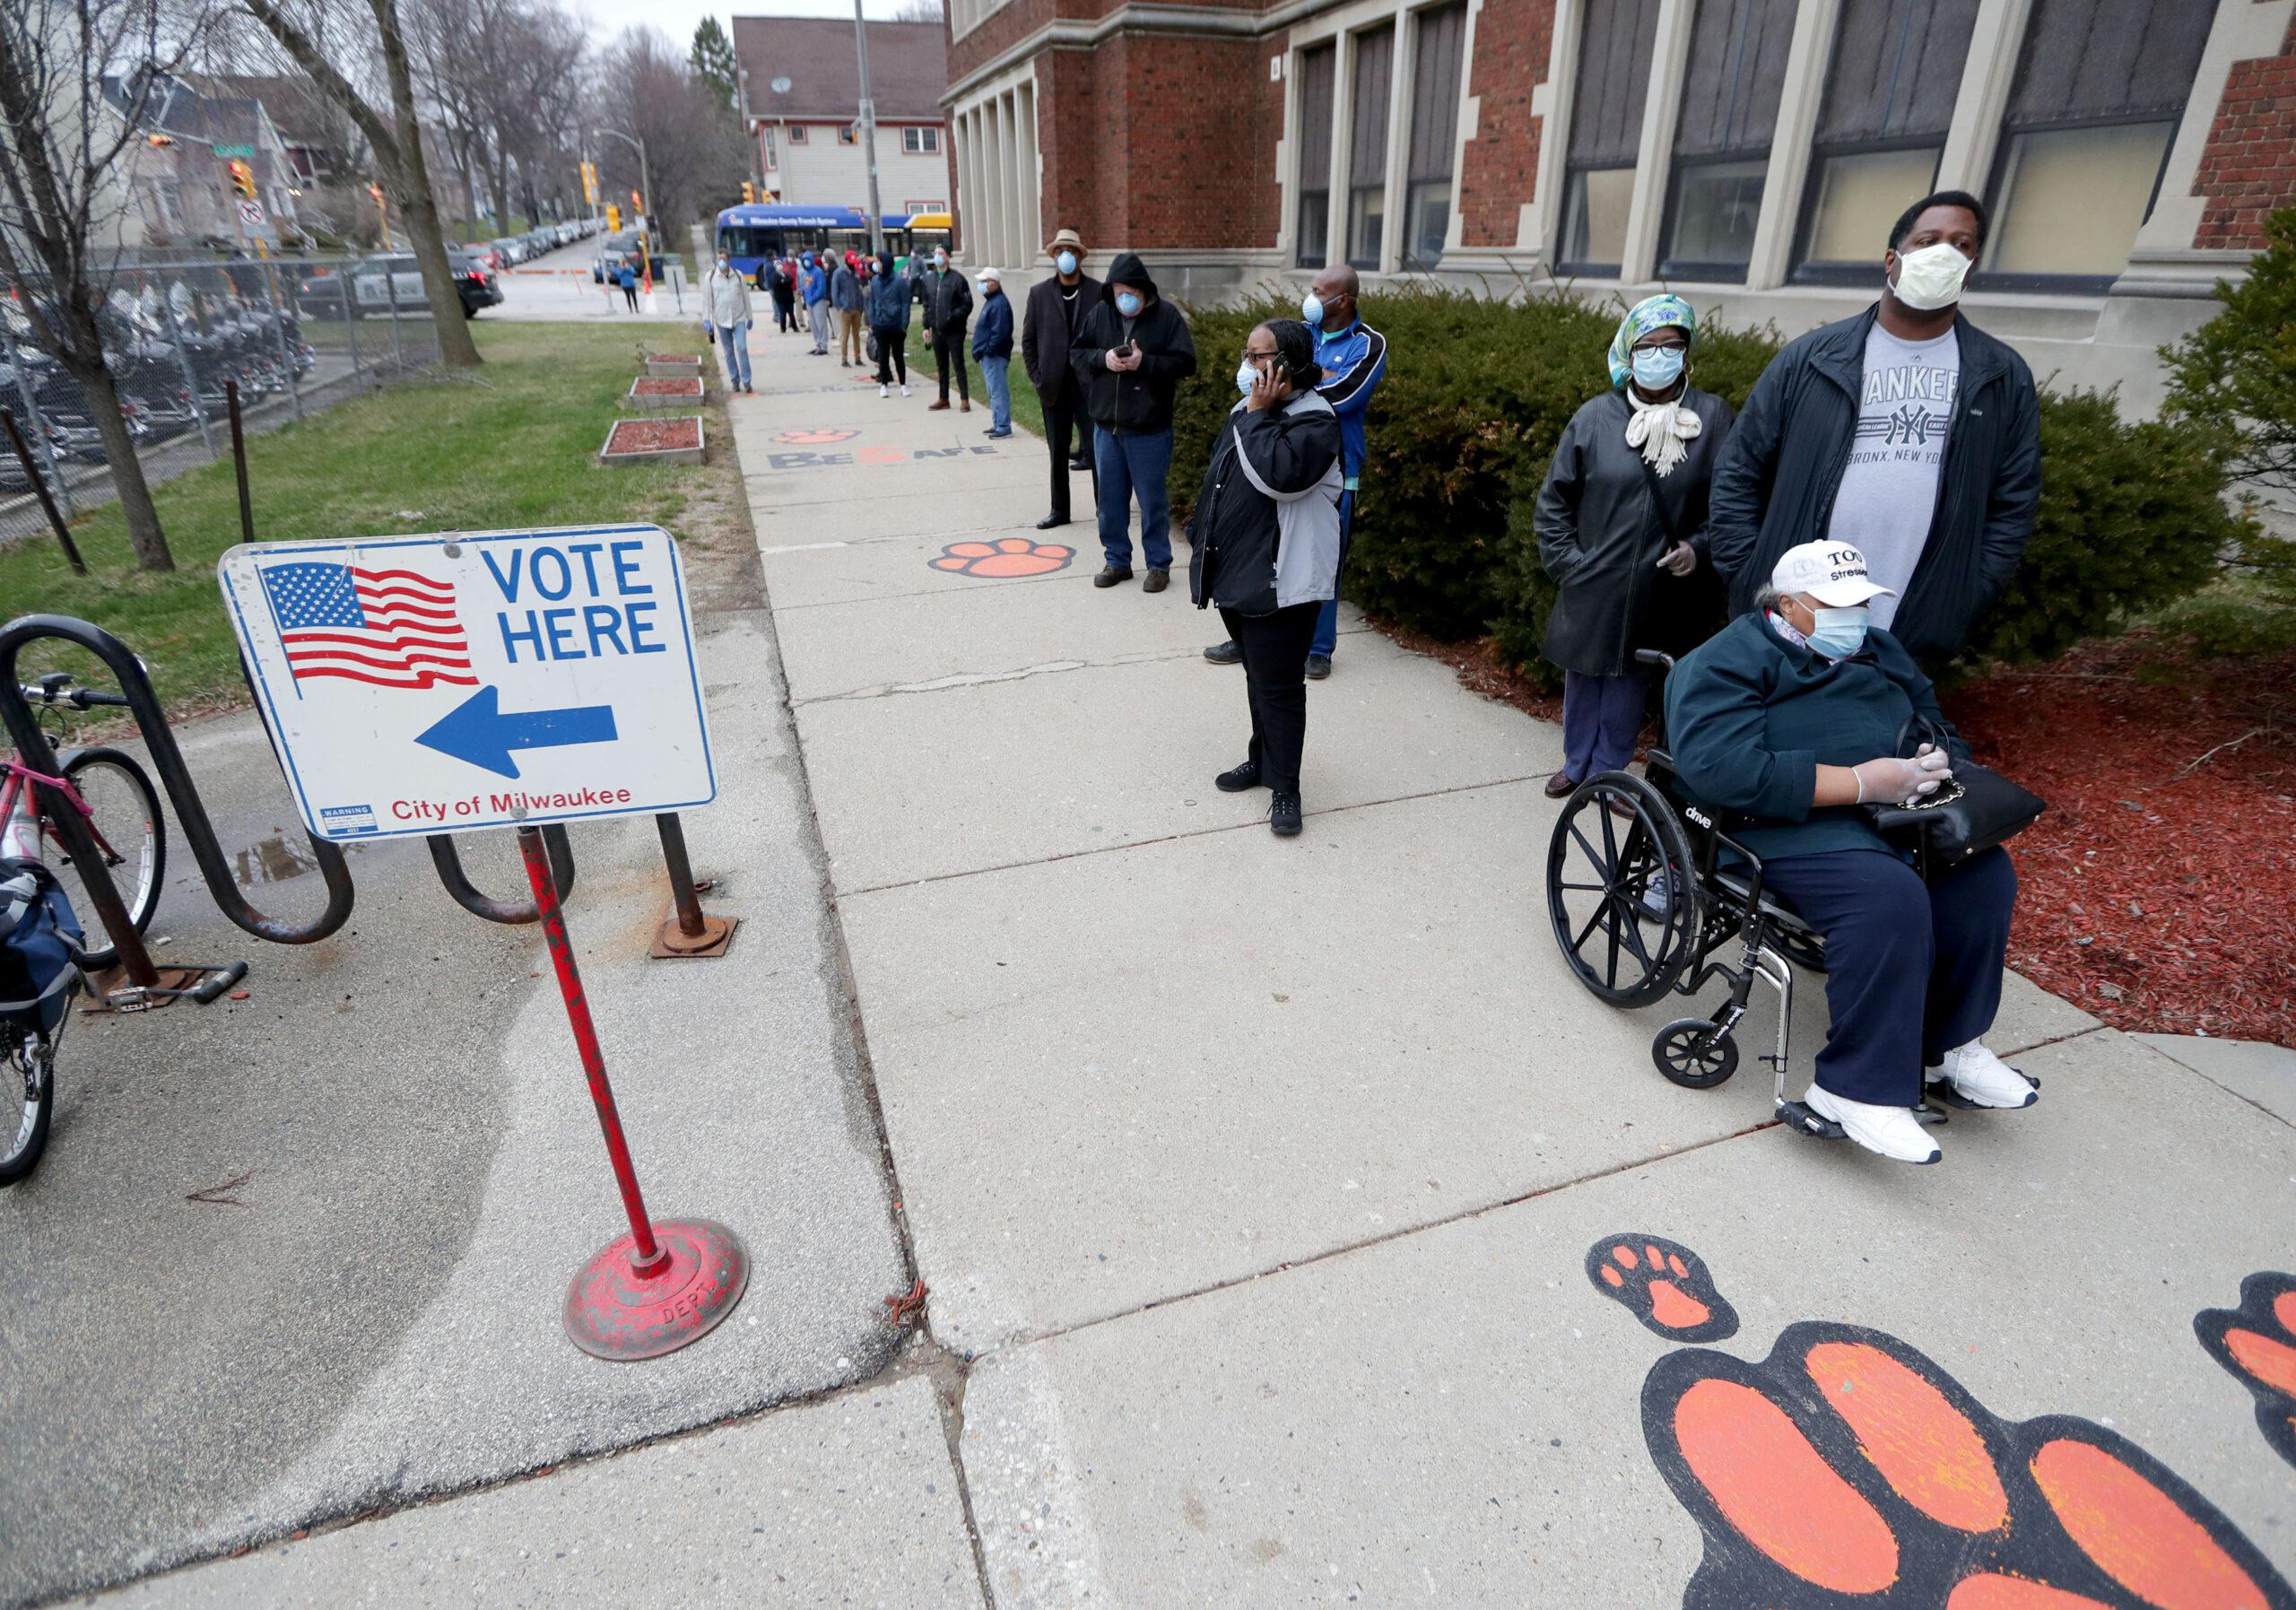 FRONTLINE: Whose Vote Counts